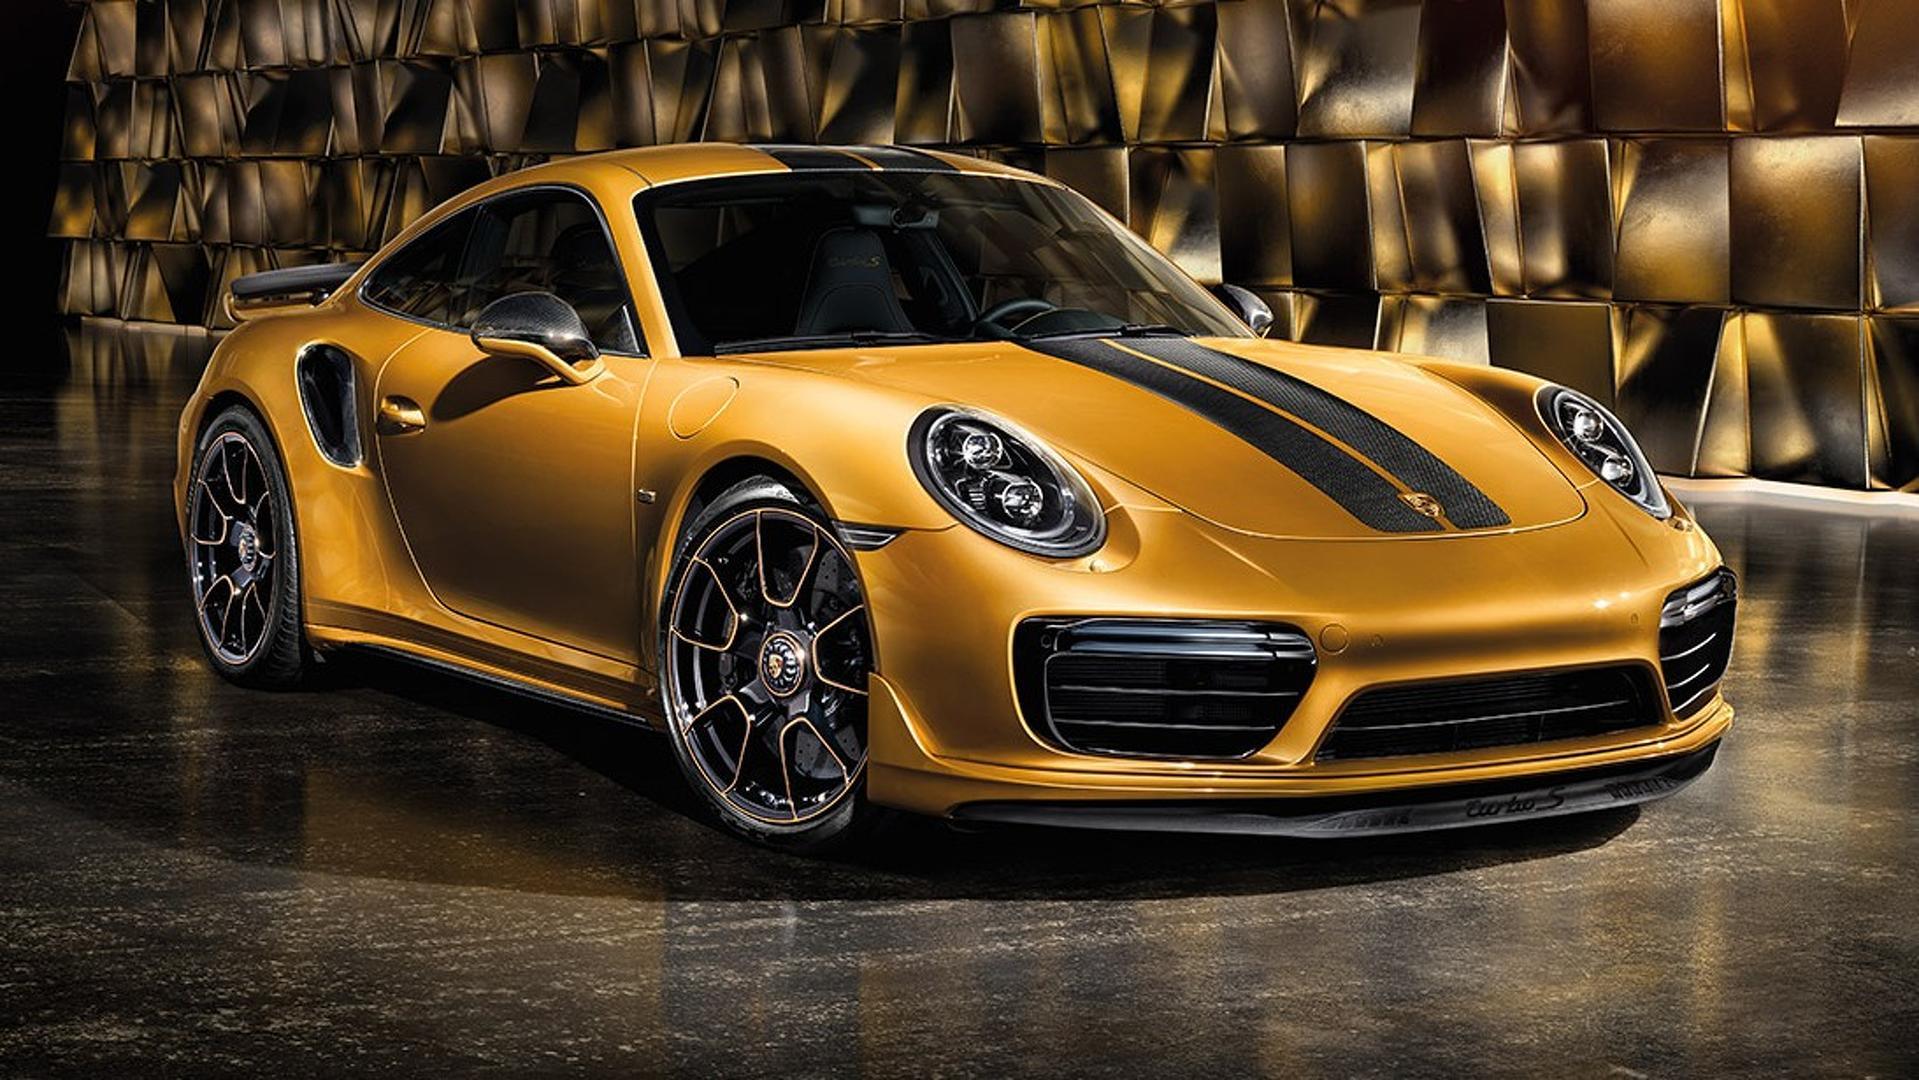 Porsche_911_Turbo_S_Exclusive_Series_31